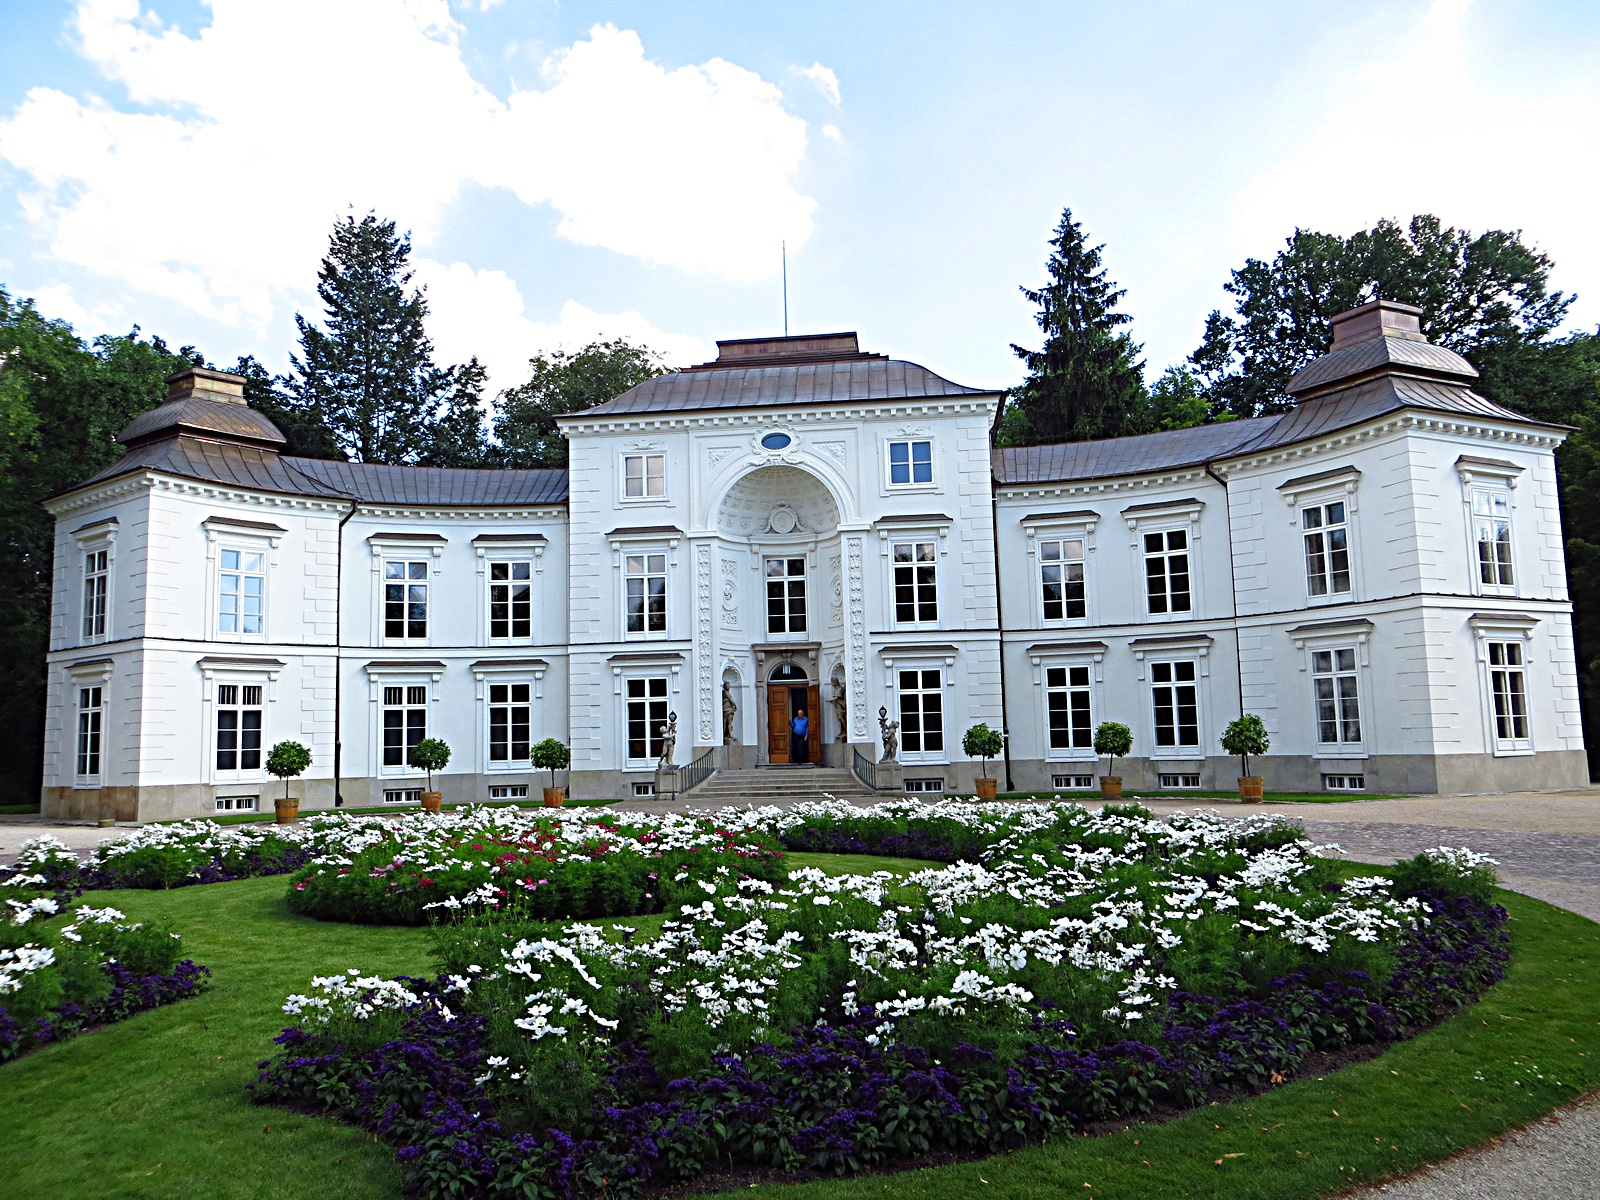 Filełazienki Królewskie Pałac Myślewicki Panoramiojpg